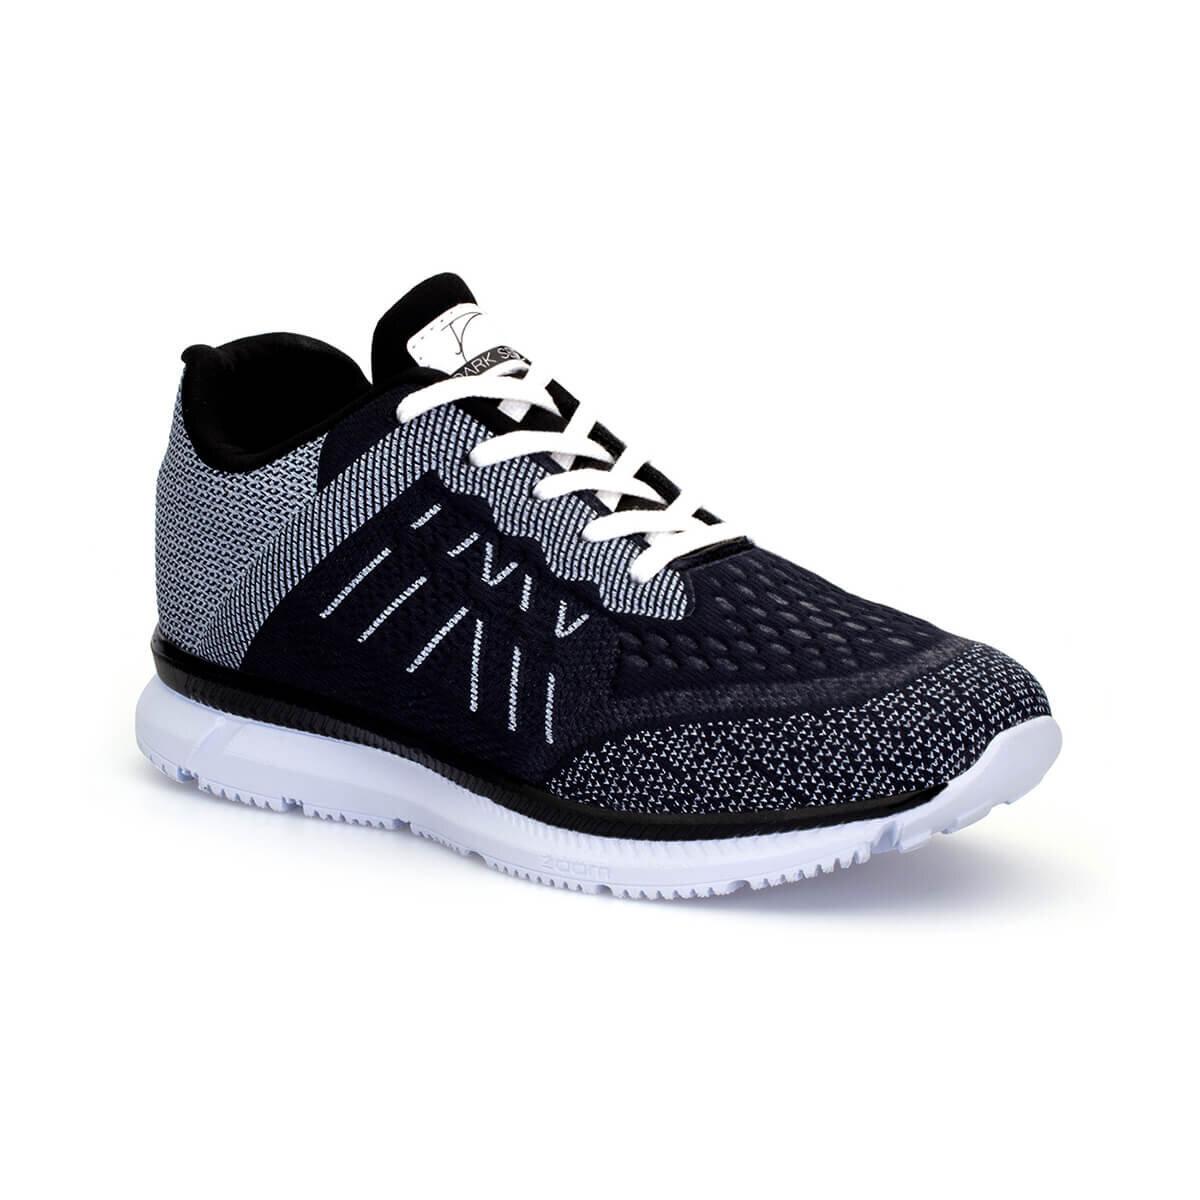 Lacivert Unisex Sneaker Ayakkabı ZOMLCT2432X